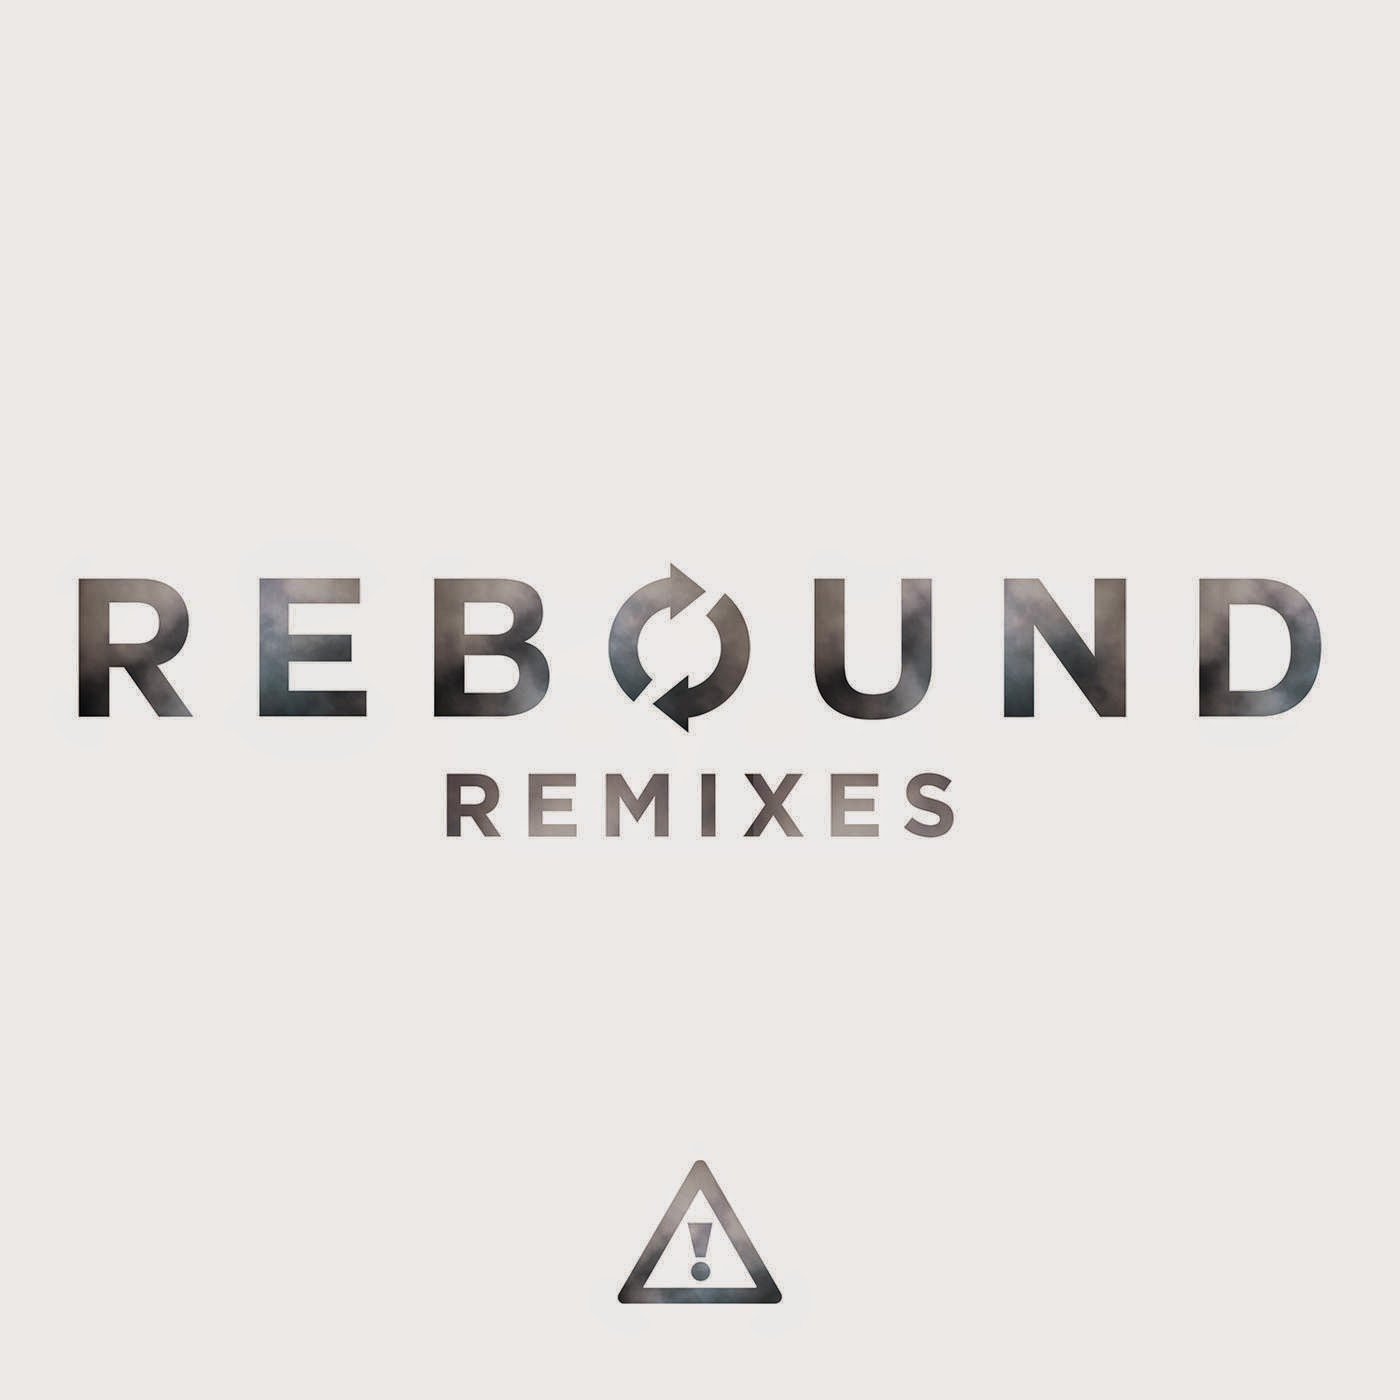 Flosstradamus - Rebound (feat. elkka) [Remixes] - EP Cover